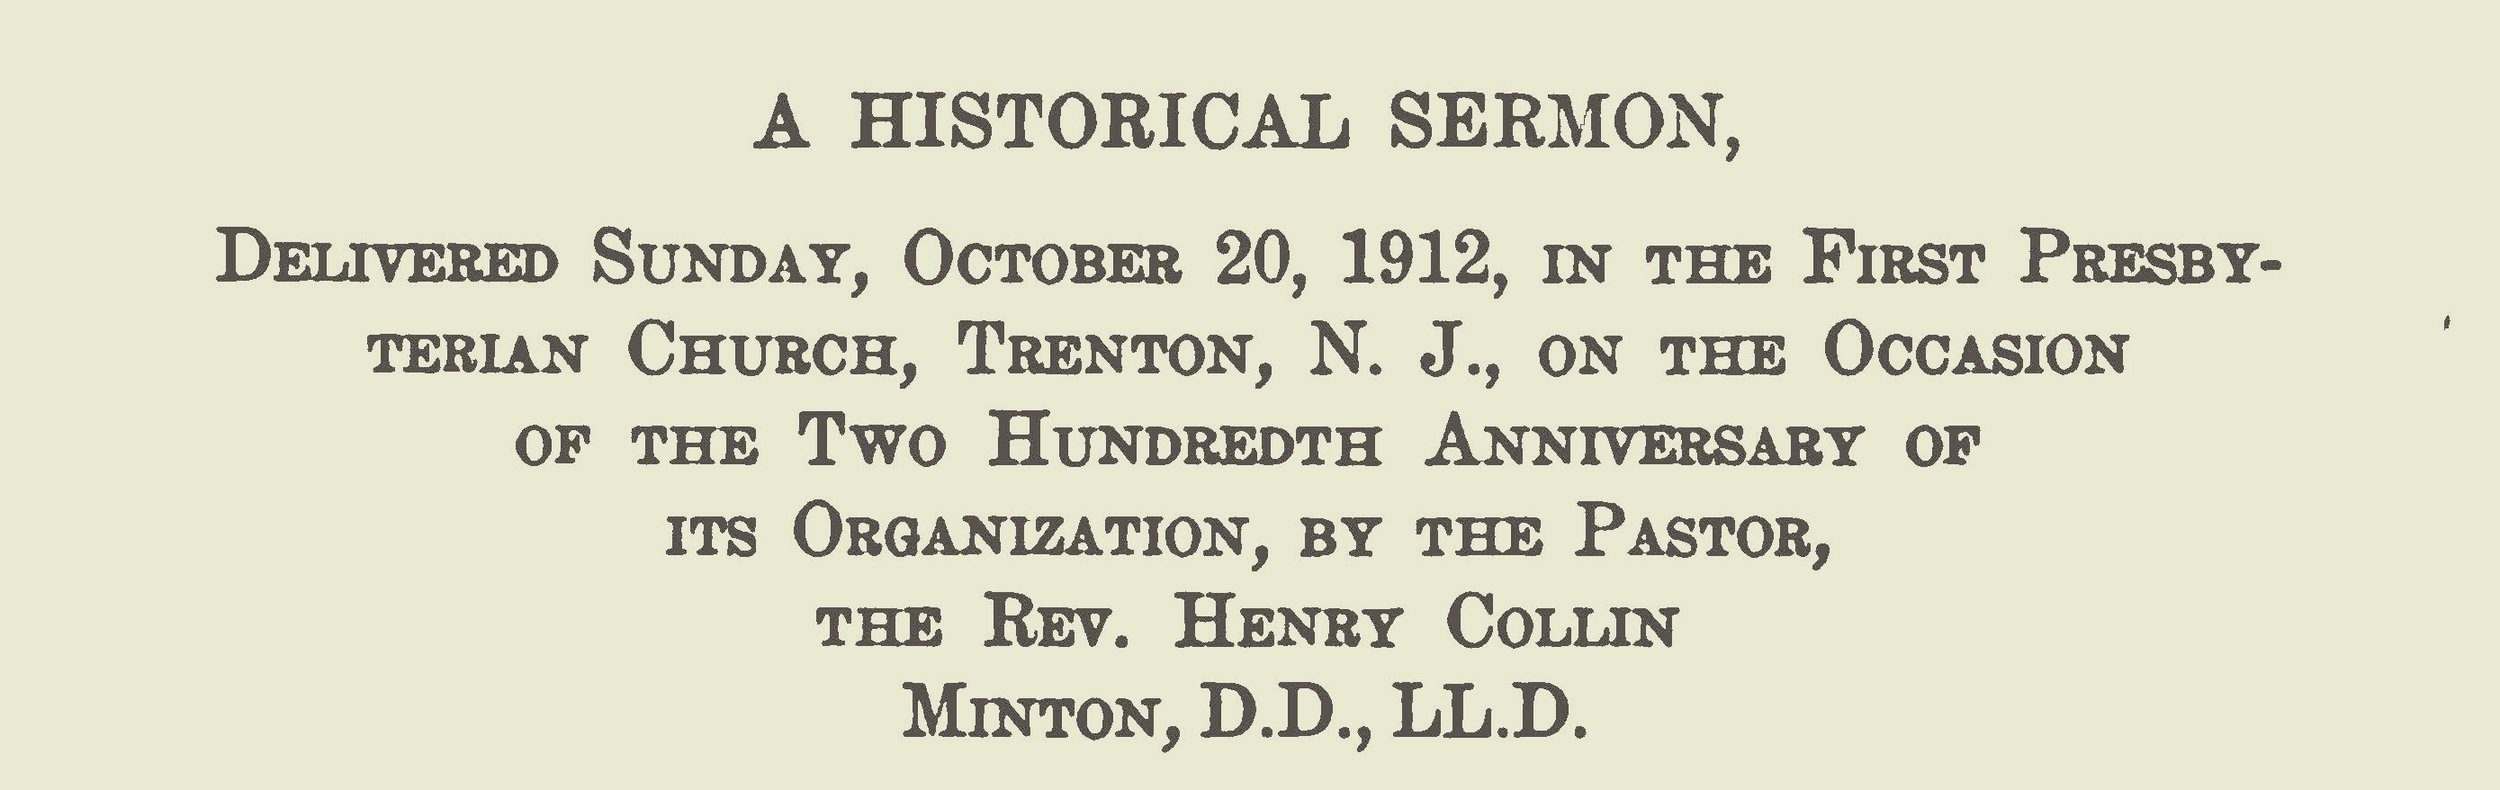 Minton, Henry Collin, A Historical Sermon Title Page.jpg